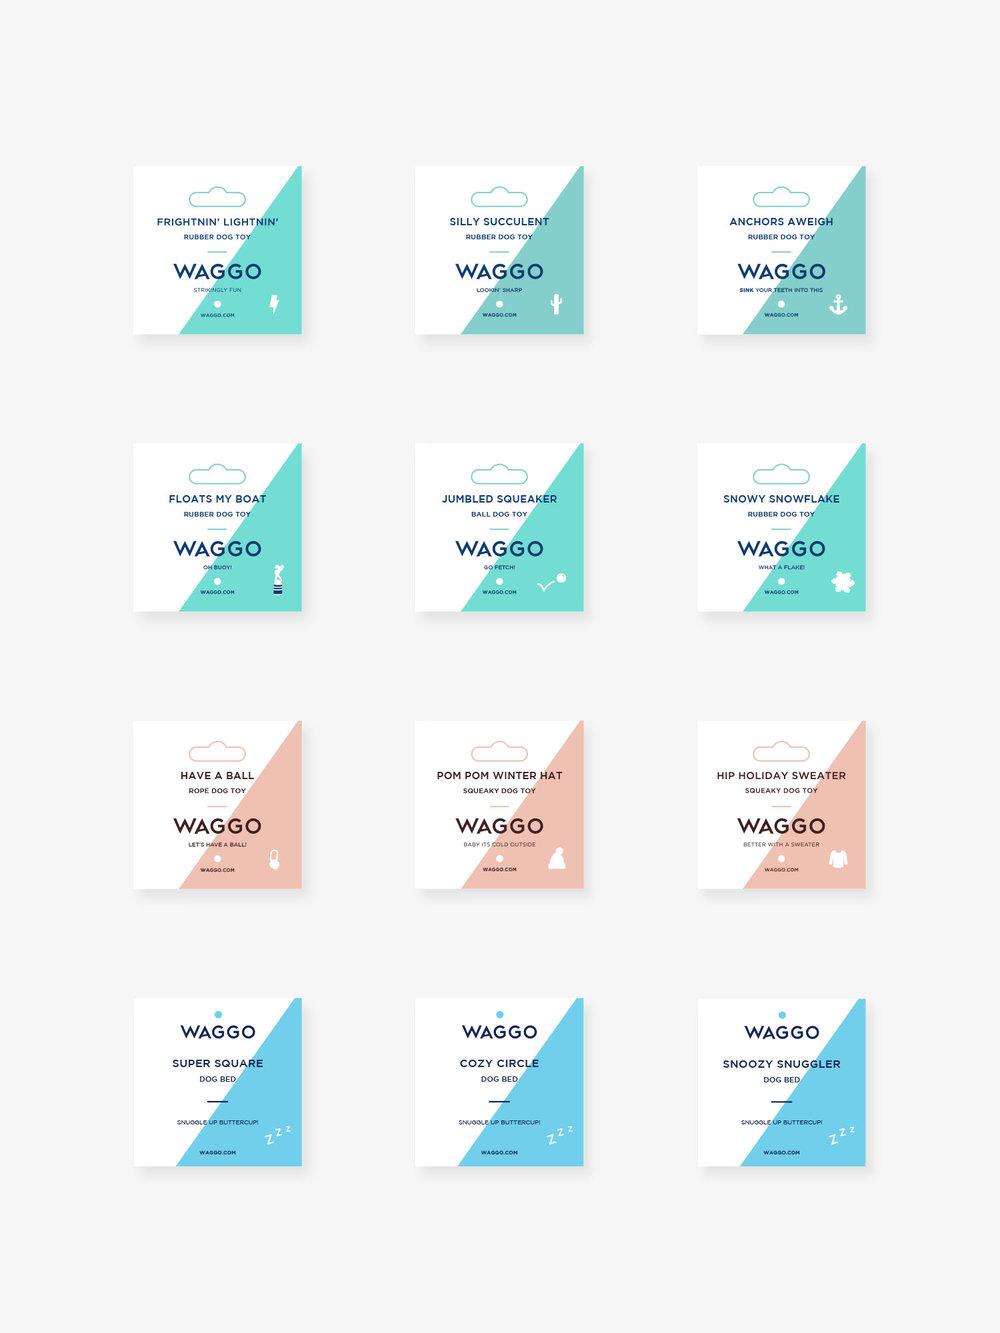 Waggo-packaging-print-retail-tag-design-graphic-designer-portland-heather-maehr.jpg